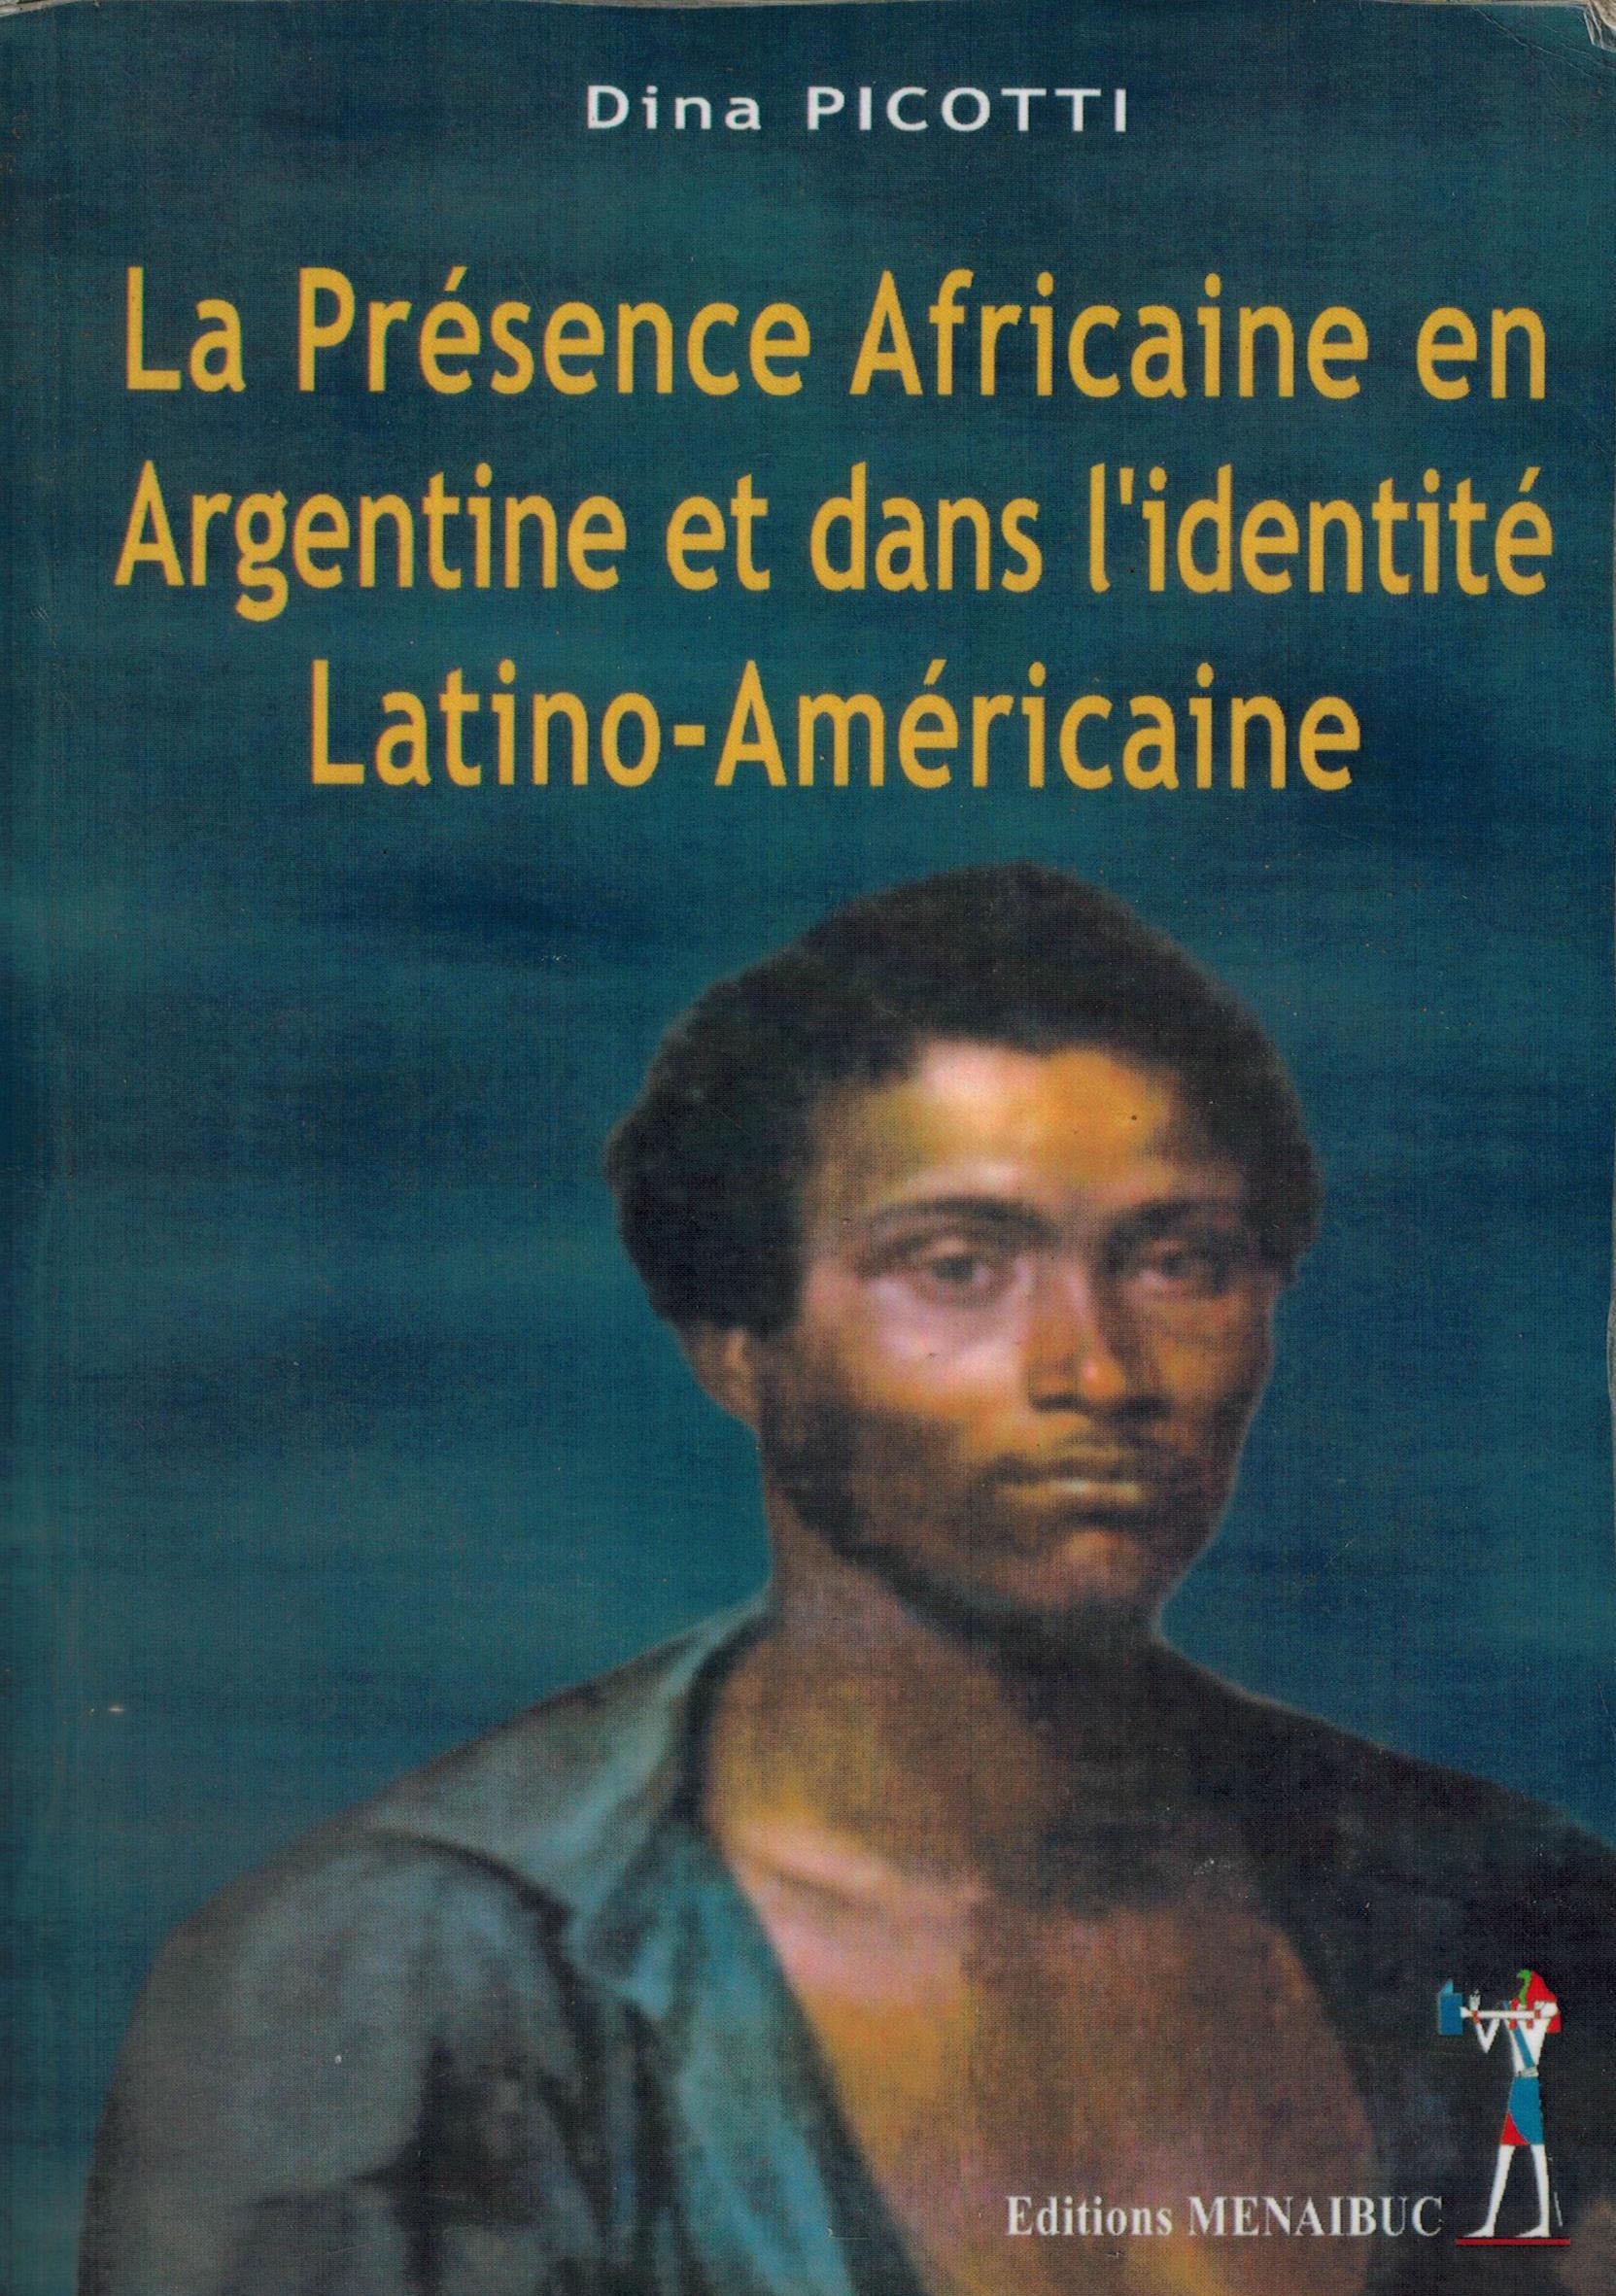 LA PRESENCE AFRICAINE EN ARGENTINE ET DANS L'IDENTITE LATINO-AMERICAINE